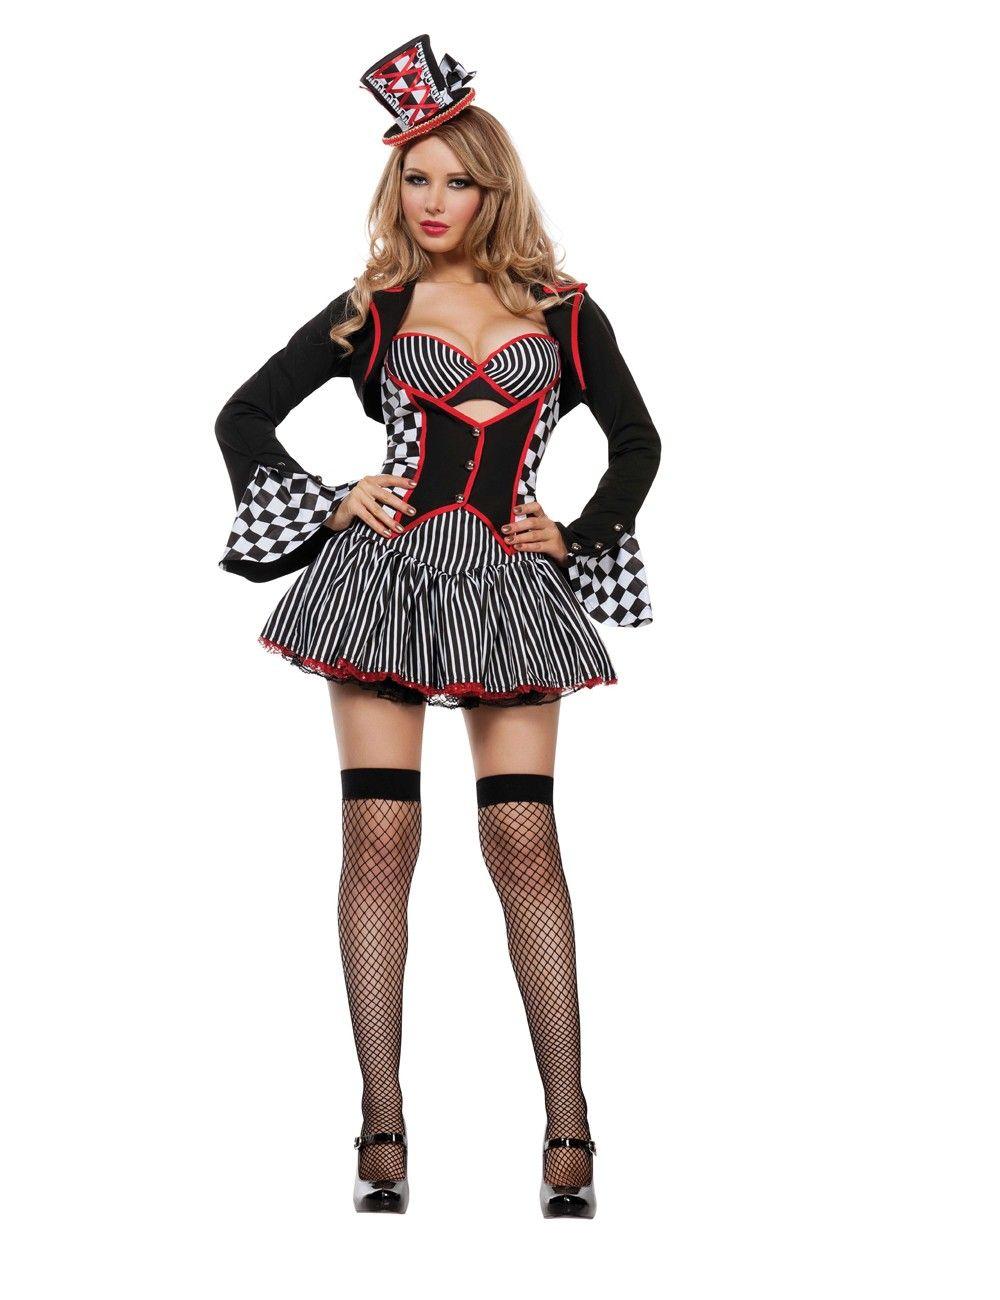 Mayhem Hatter Costume  costumes  Pinterest  Costumes Woman